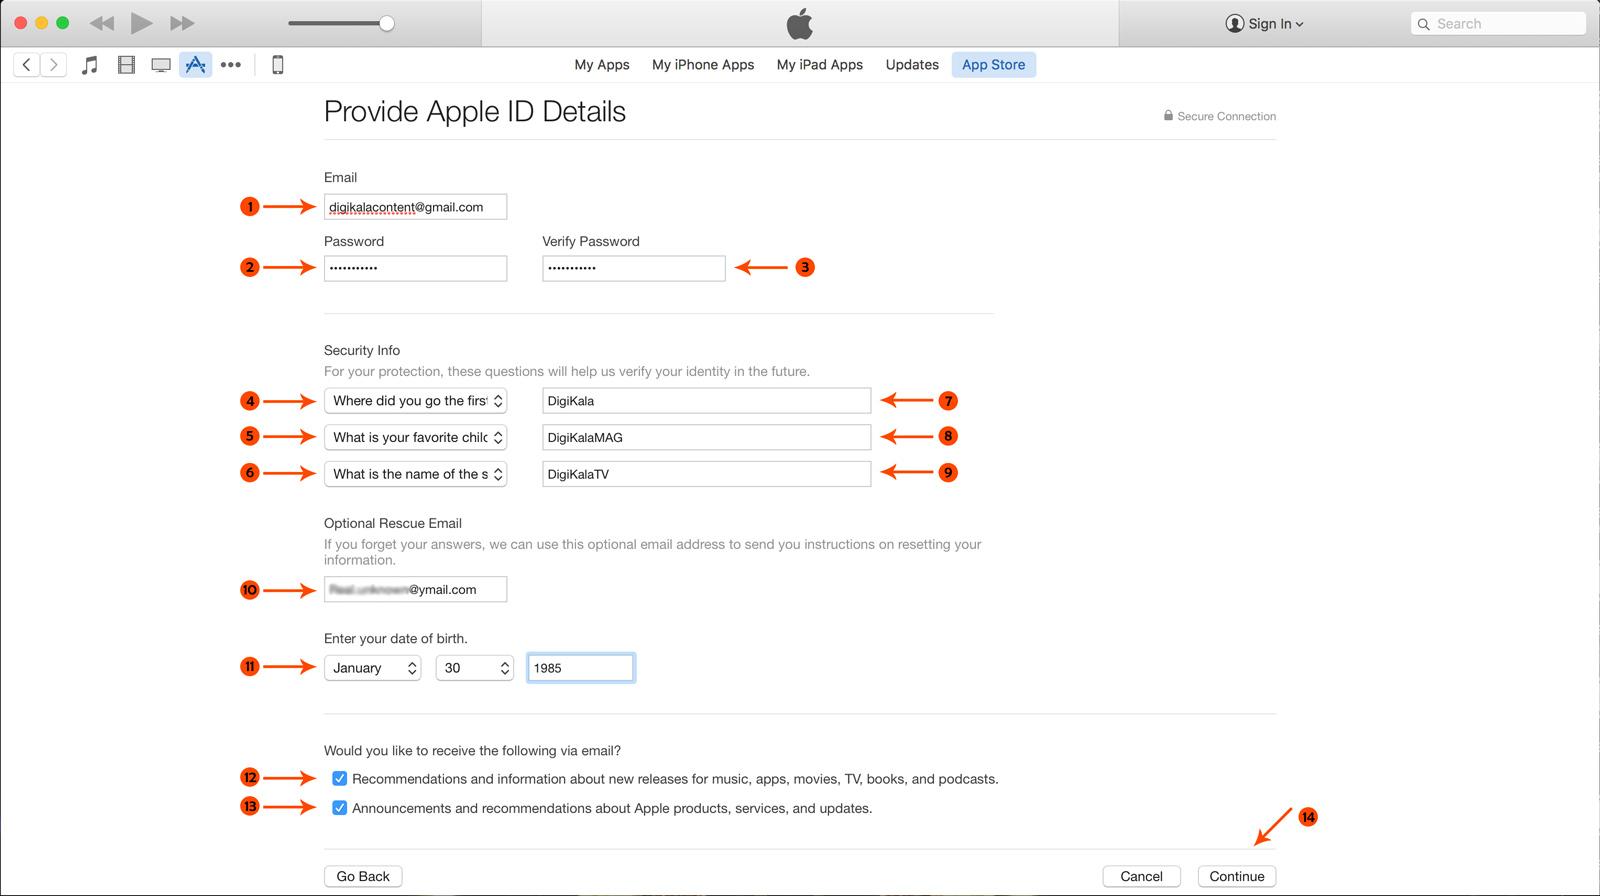 Apple ID 07 خرید اپل آیدی,خرید اپل آیدی ارزان,خرید اپل آیدی آماده